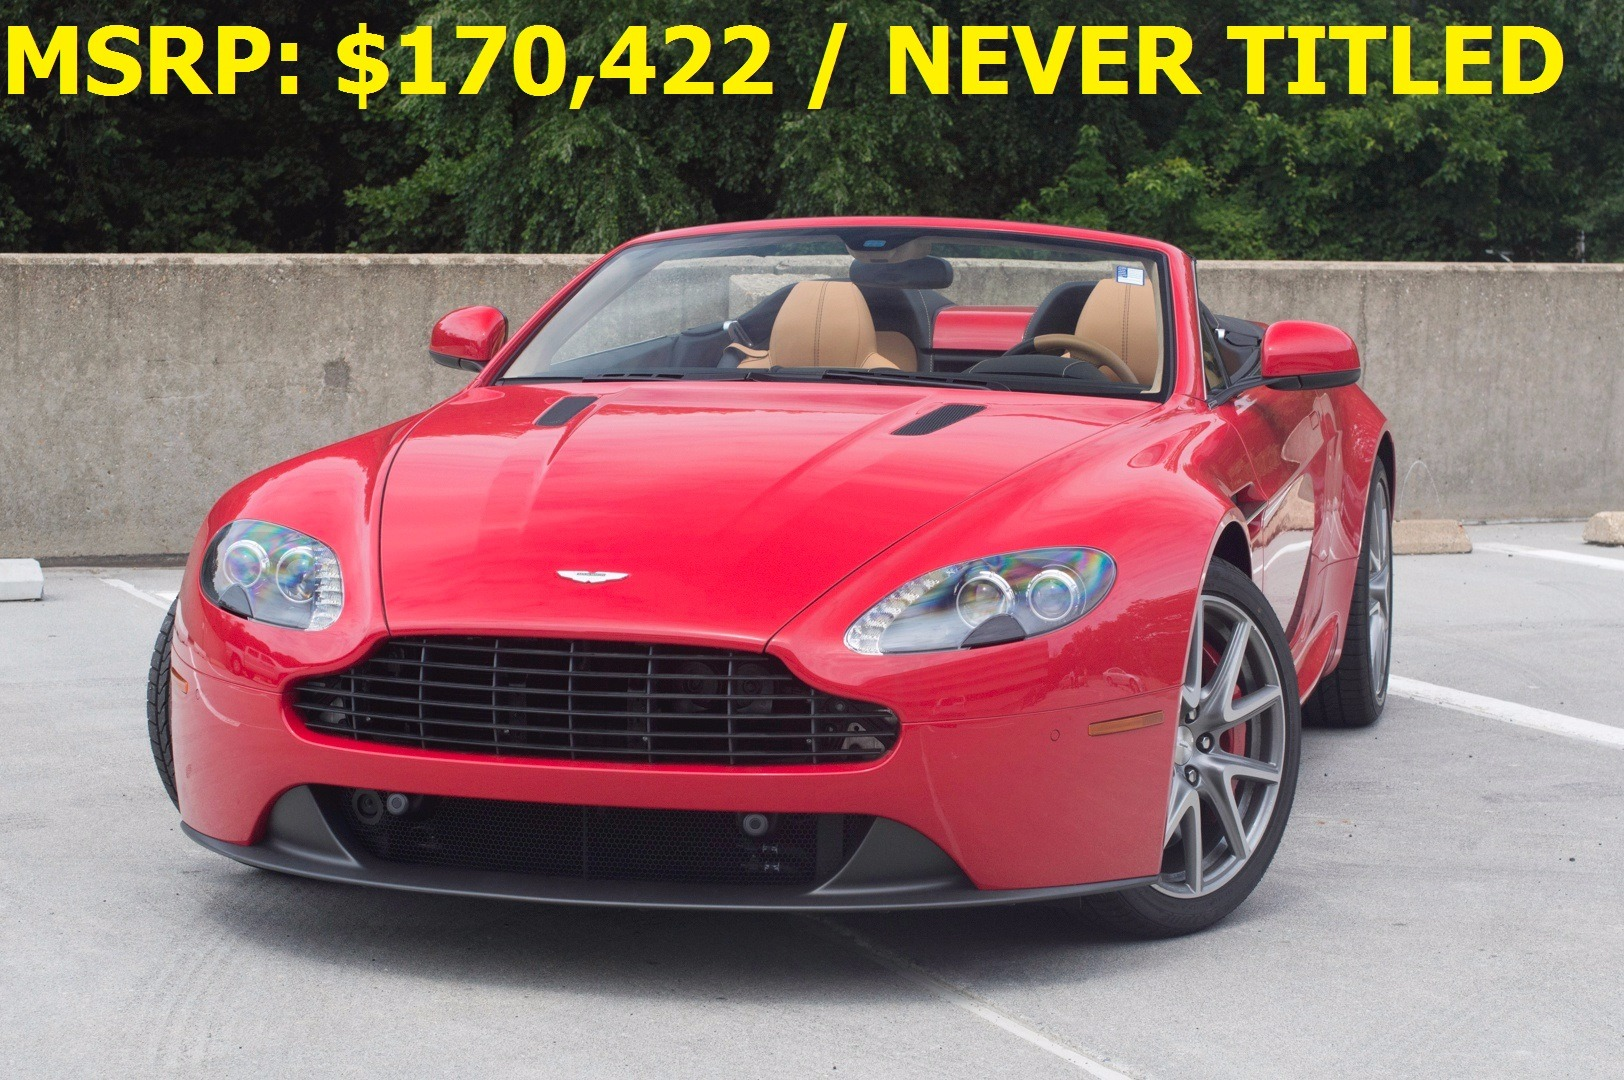 2014 Aston Martin V8 Vantage Roadster Roadster Stock 4nd18220 For Sale Near Vienna Va Va Aston Martin Dealer